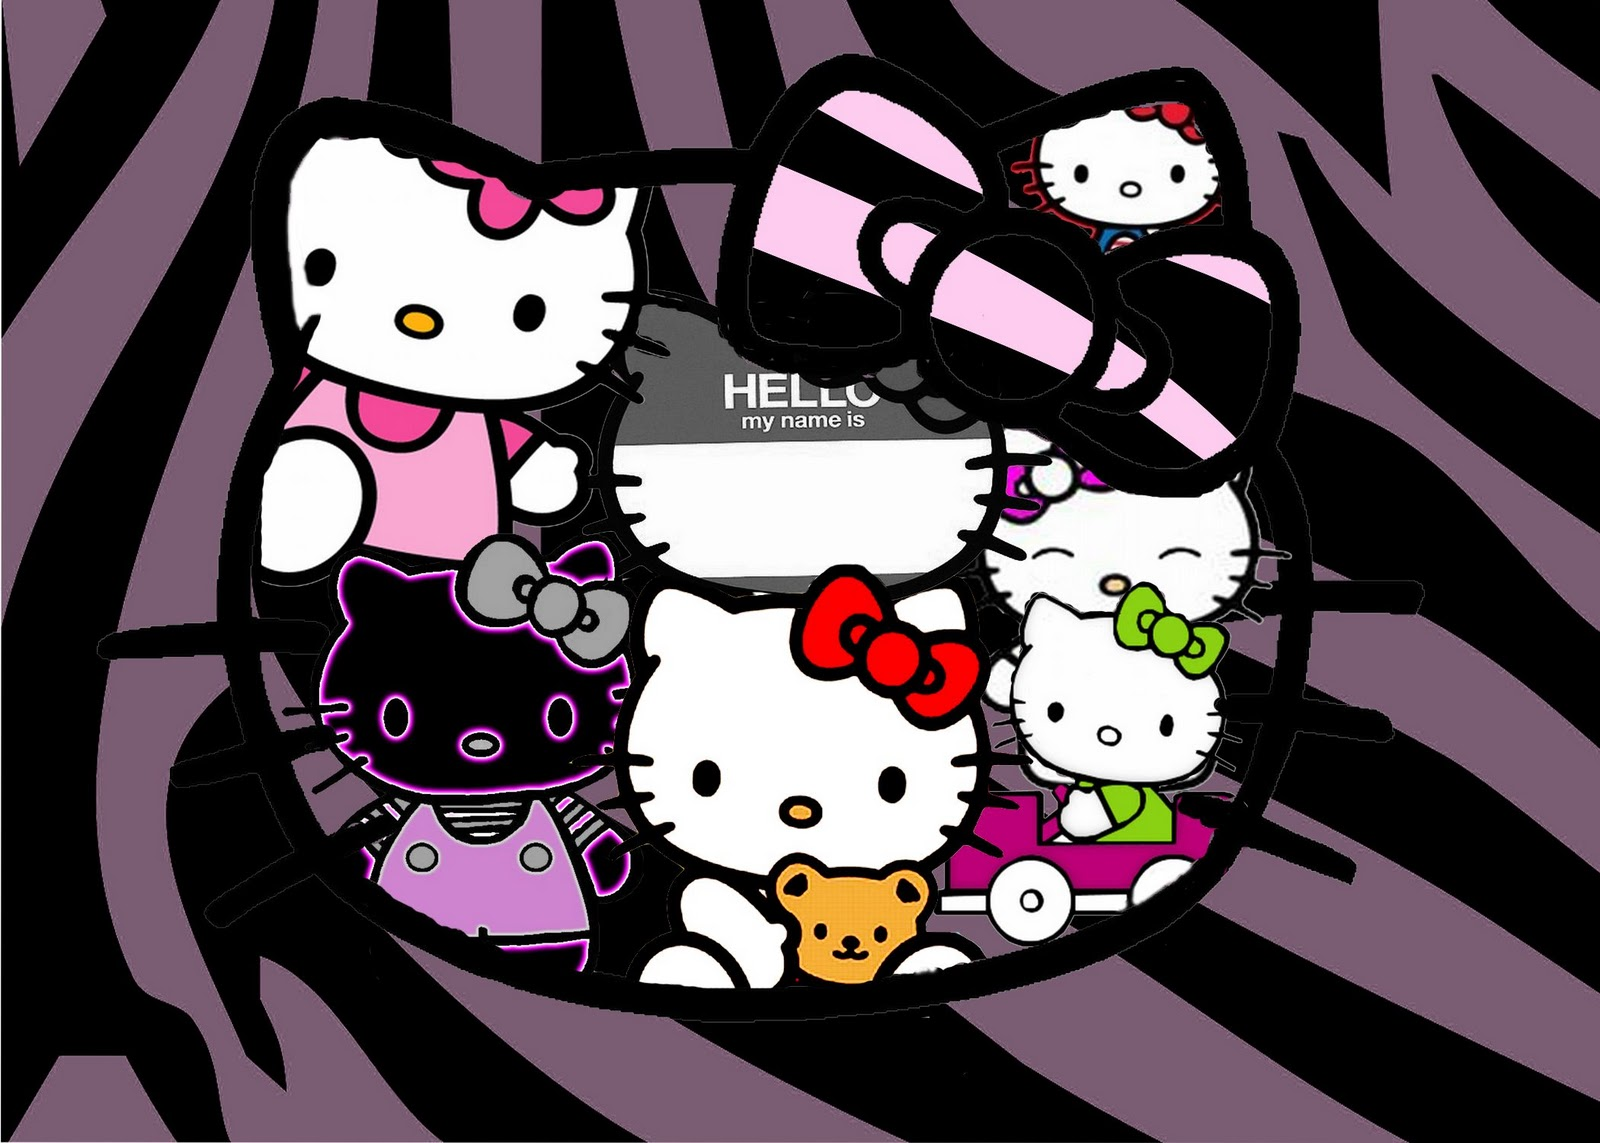 Car Wallpaper Desktop >> 3D Hello Kitty Wallpaper - WallpaperSafari